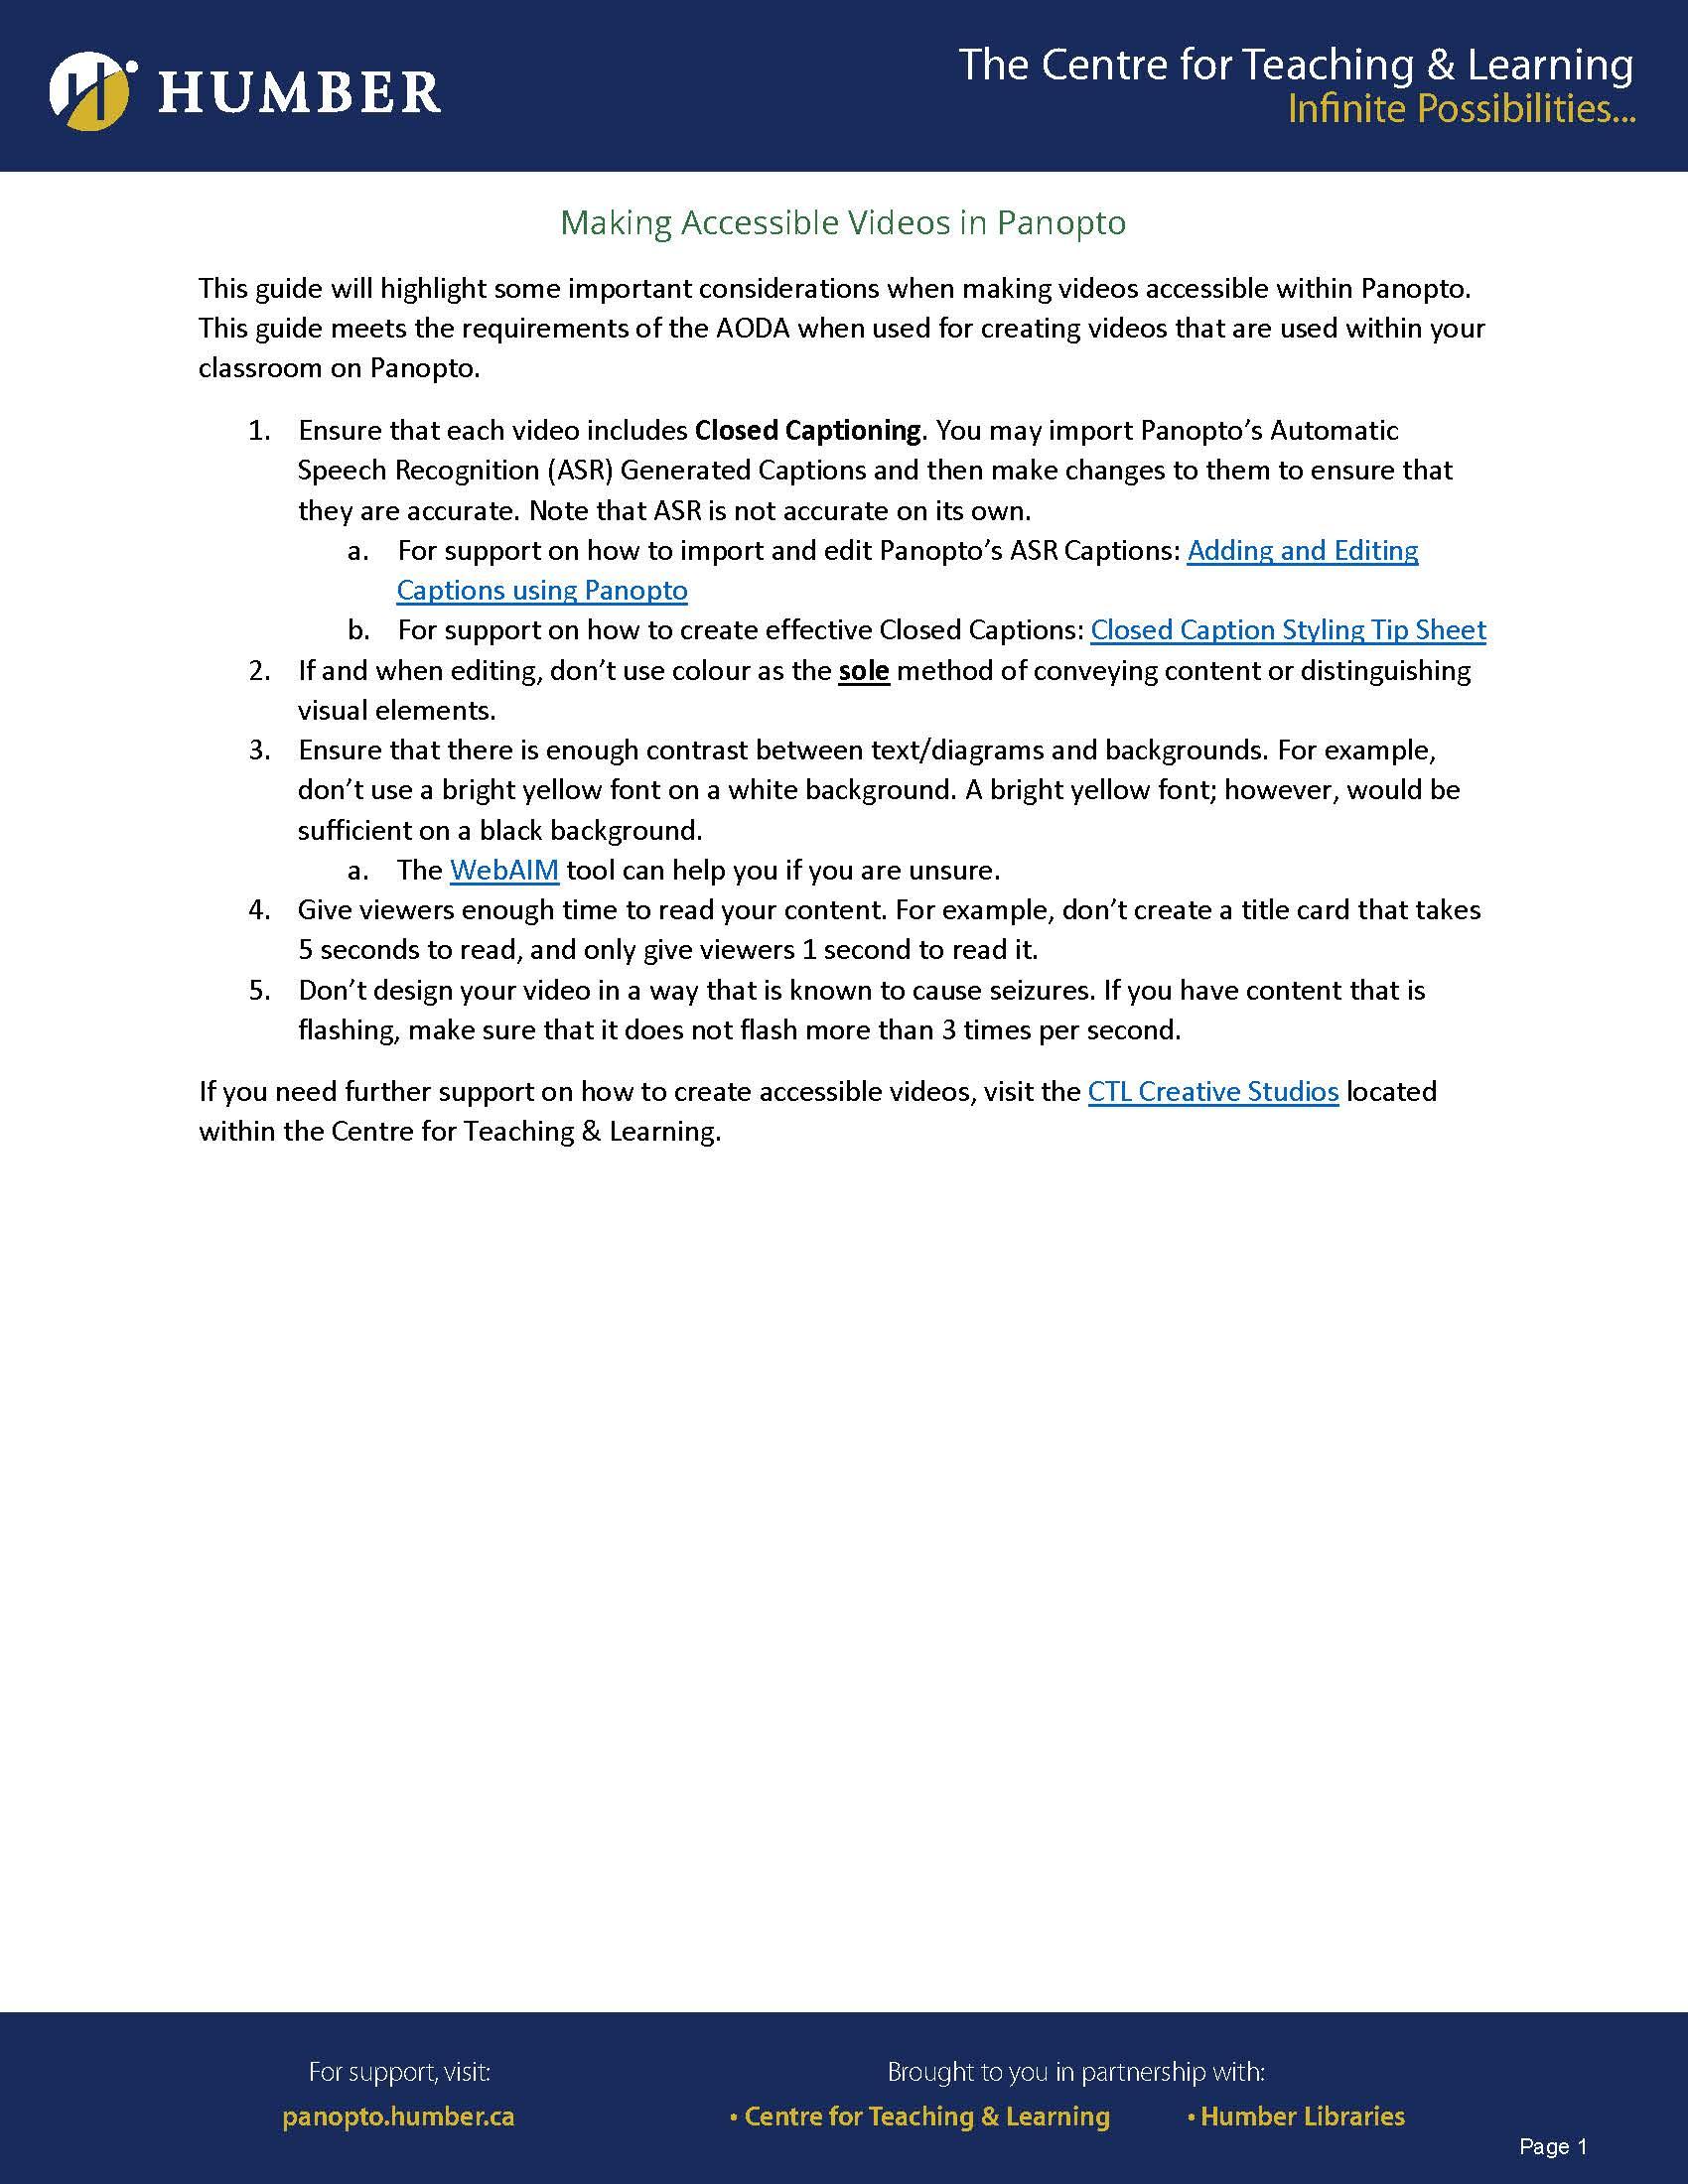 Job Aid PDF image